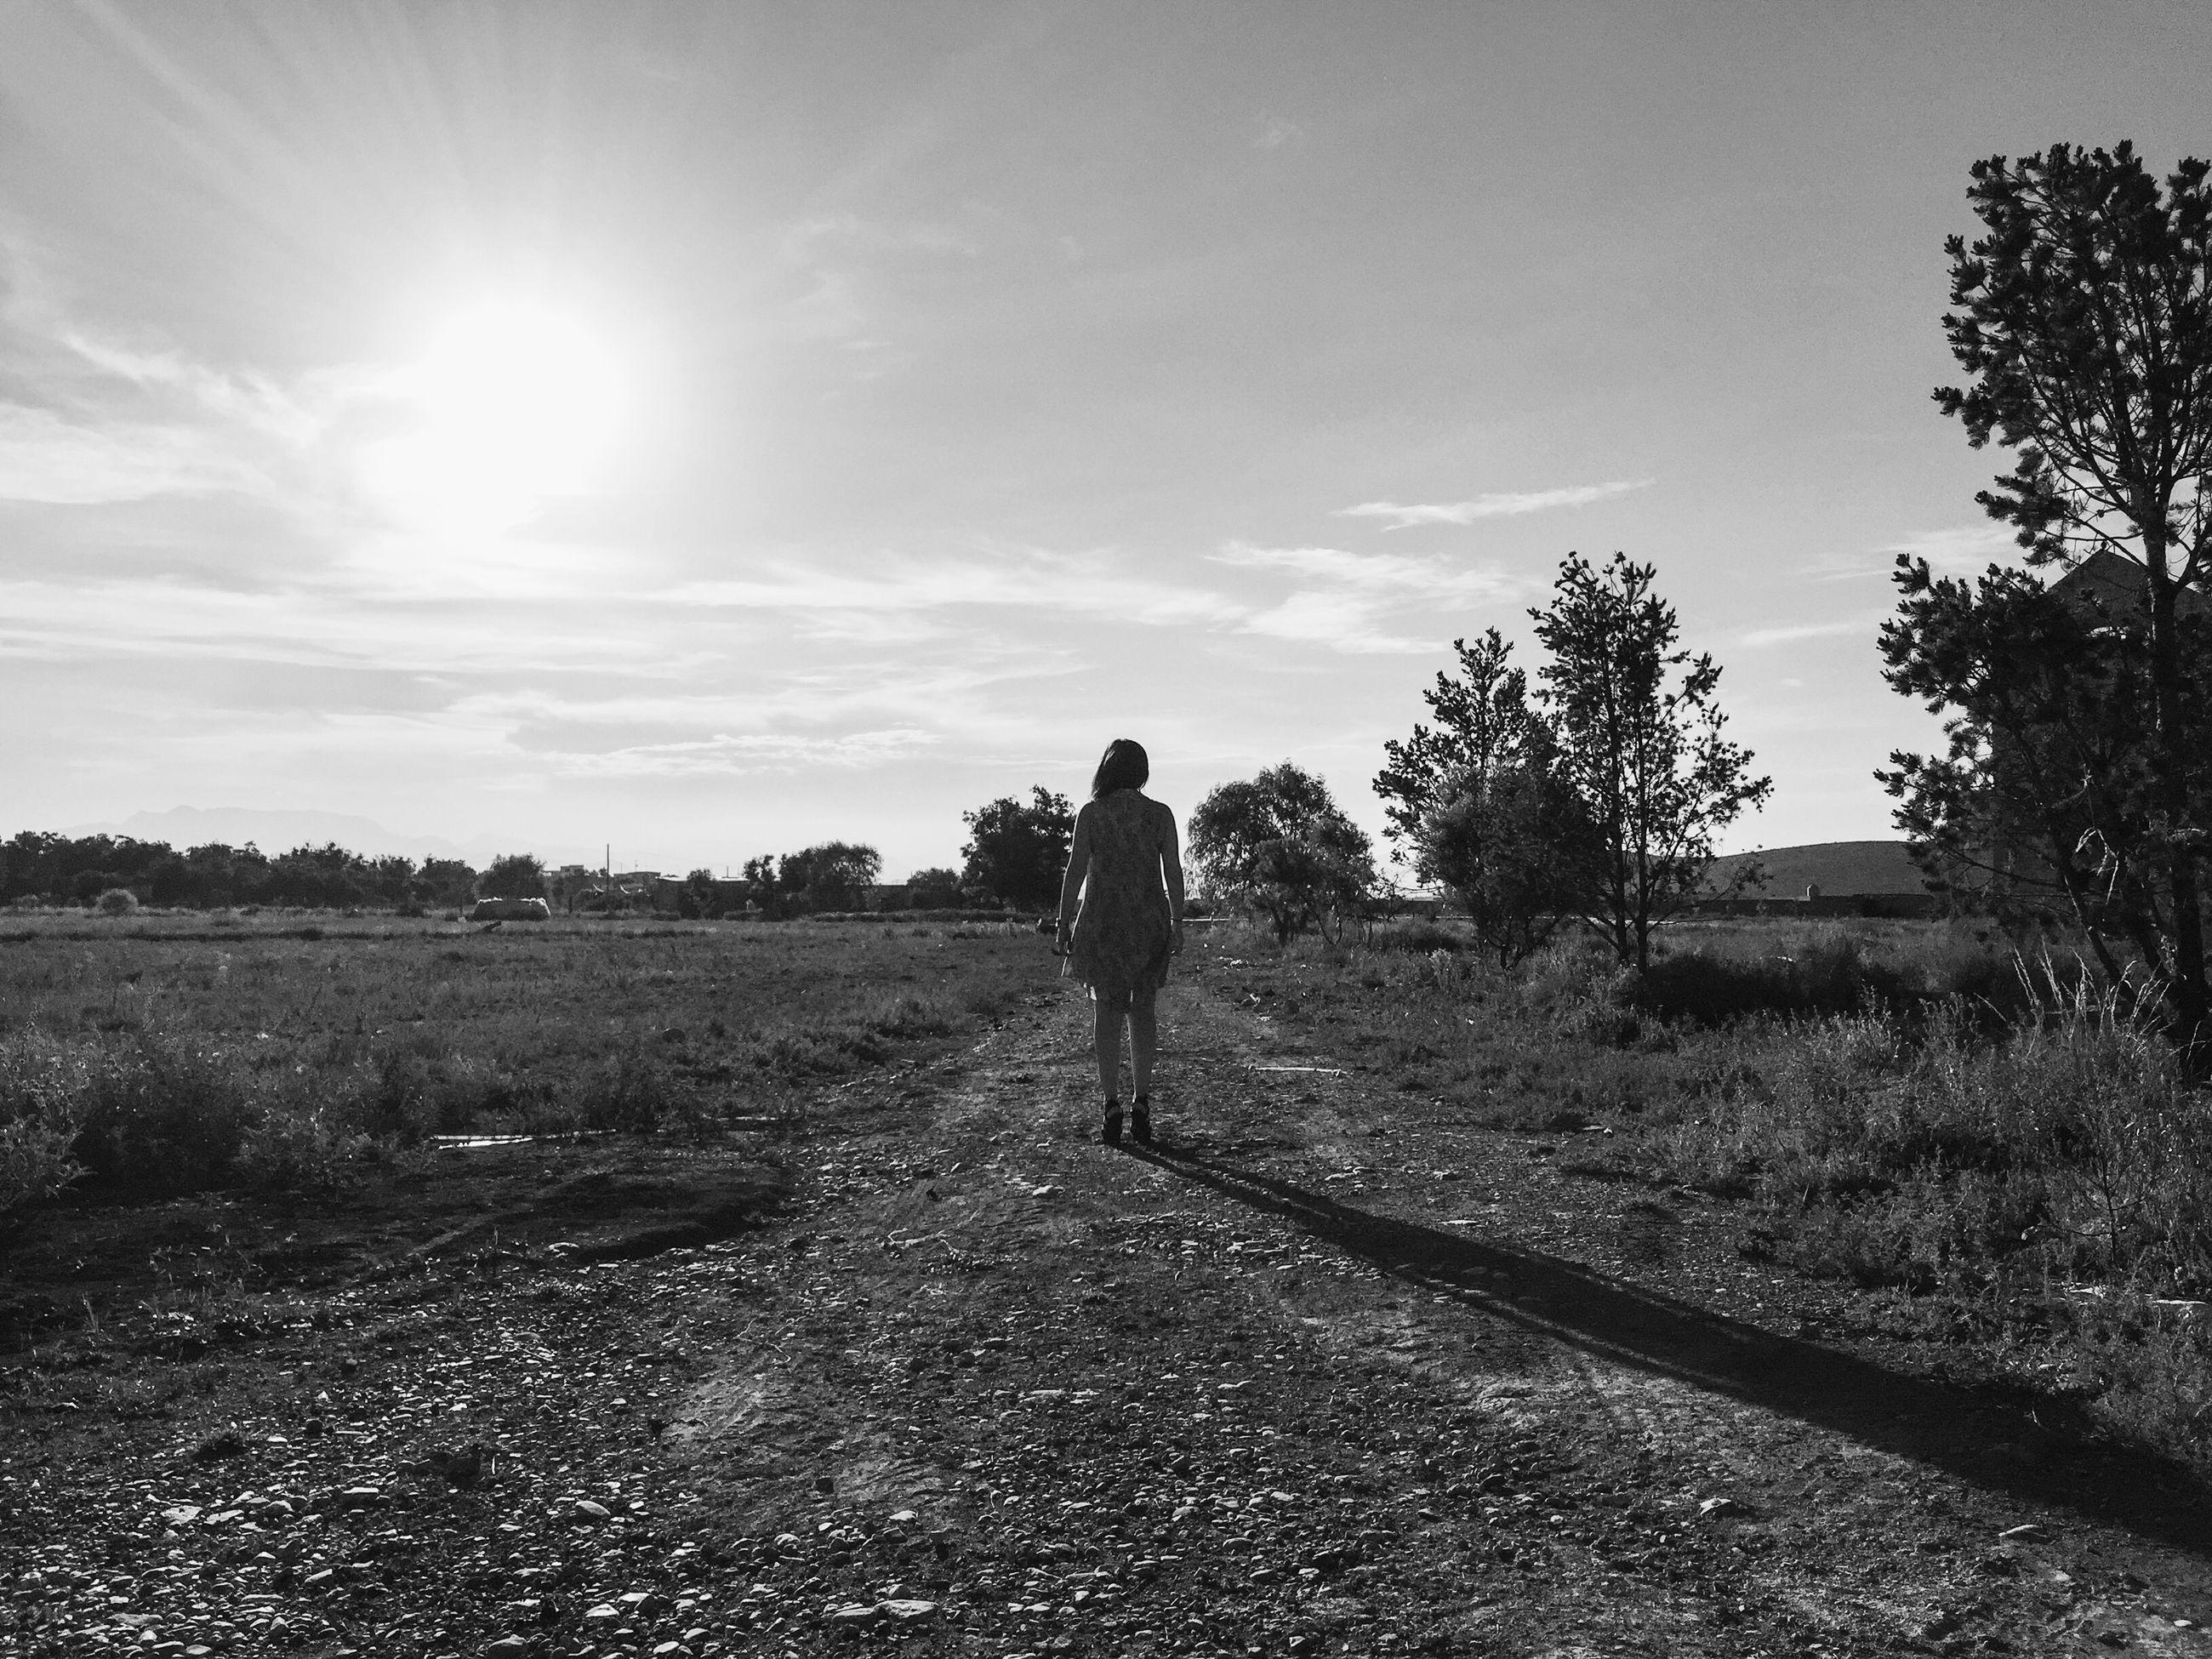 sunlight, lifestyles, tree, field, walking, sky, full length, leisure activity, grass, rear view, landscape, sun, the way forward, men, tranquility, nature, shadow, sunbeam